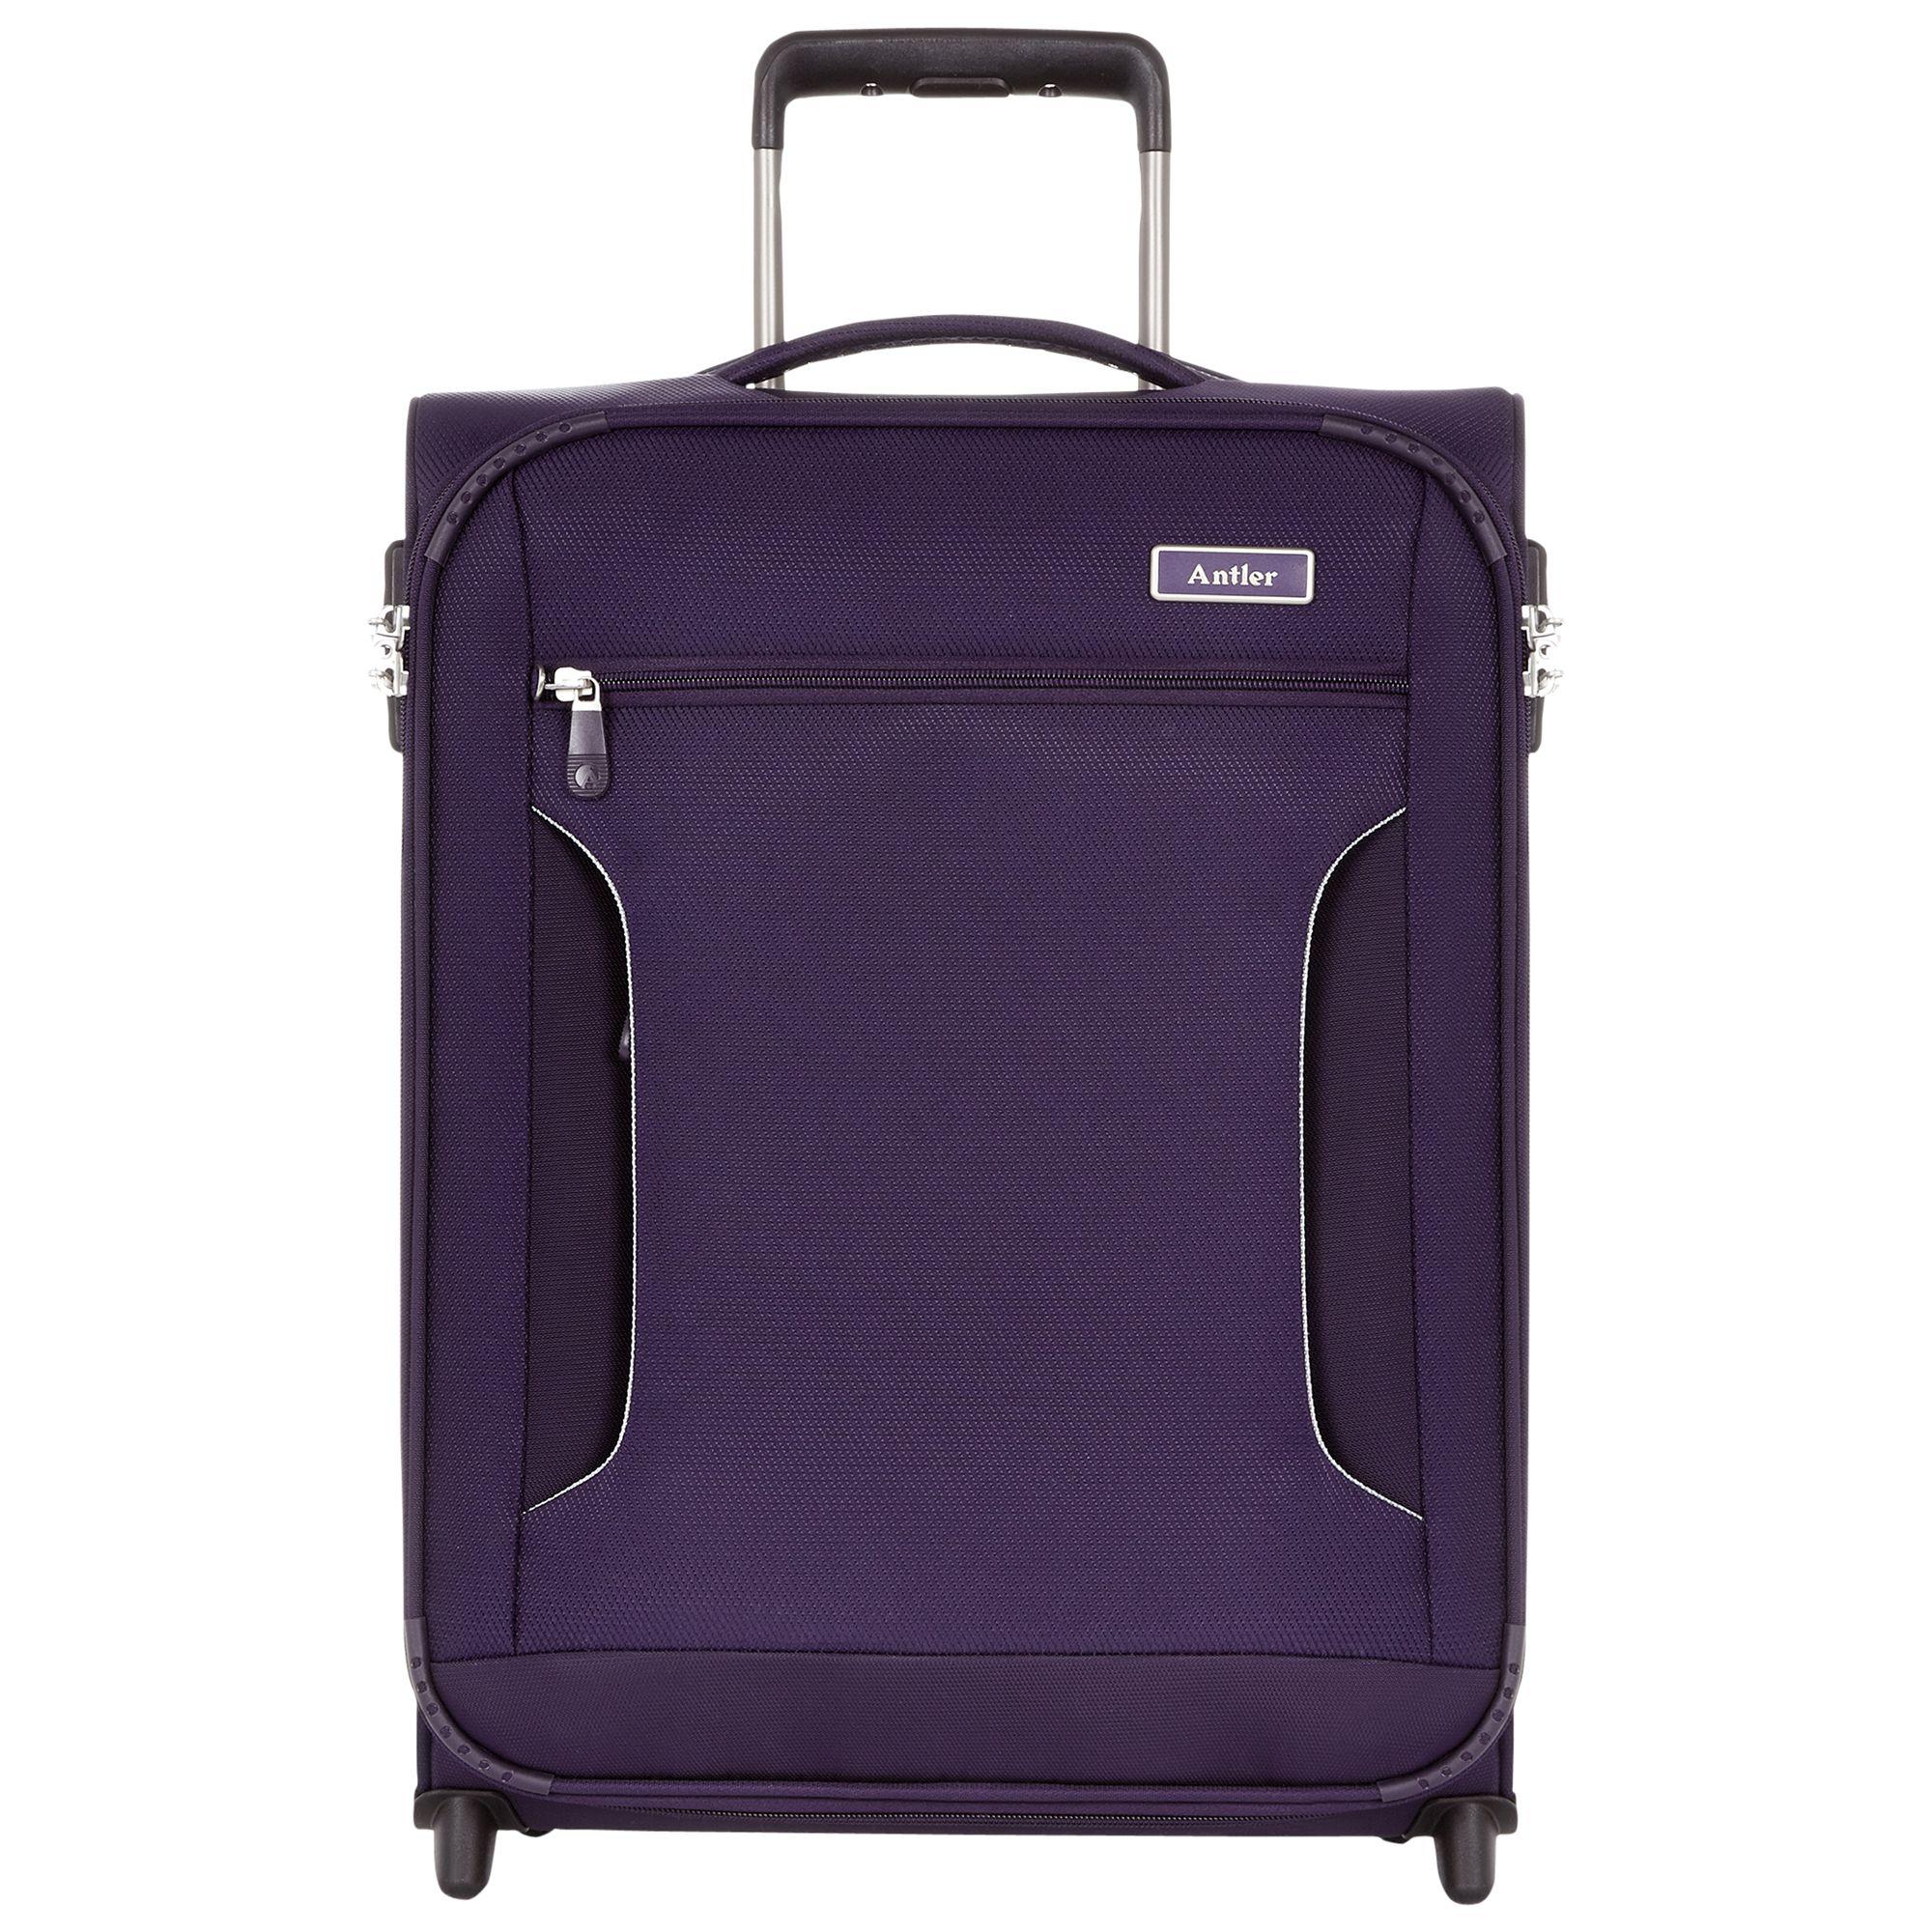 Antler Antler Cyberlite II 2-Wheel 55cm Cabin Suitcase